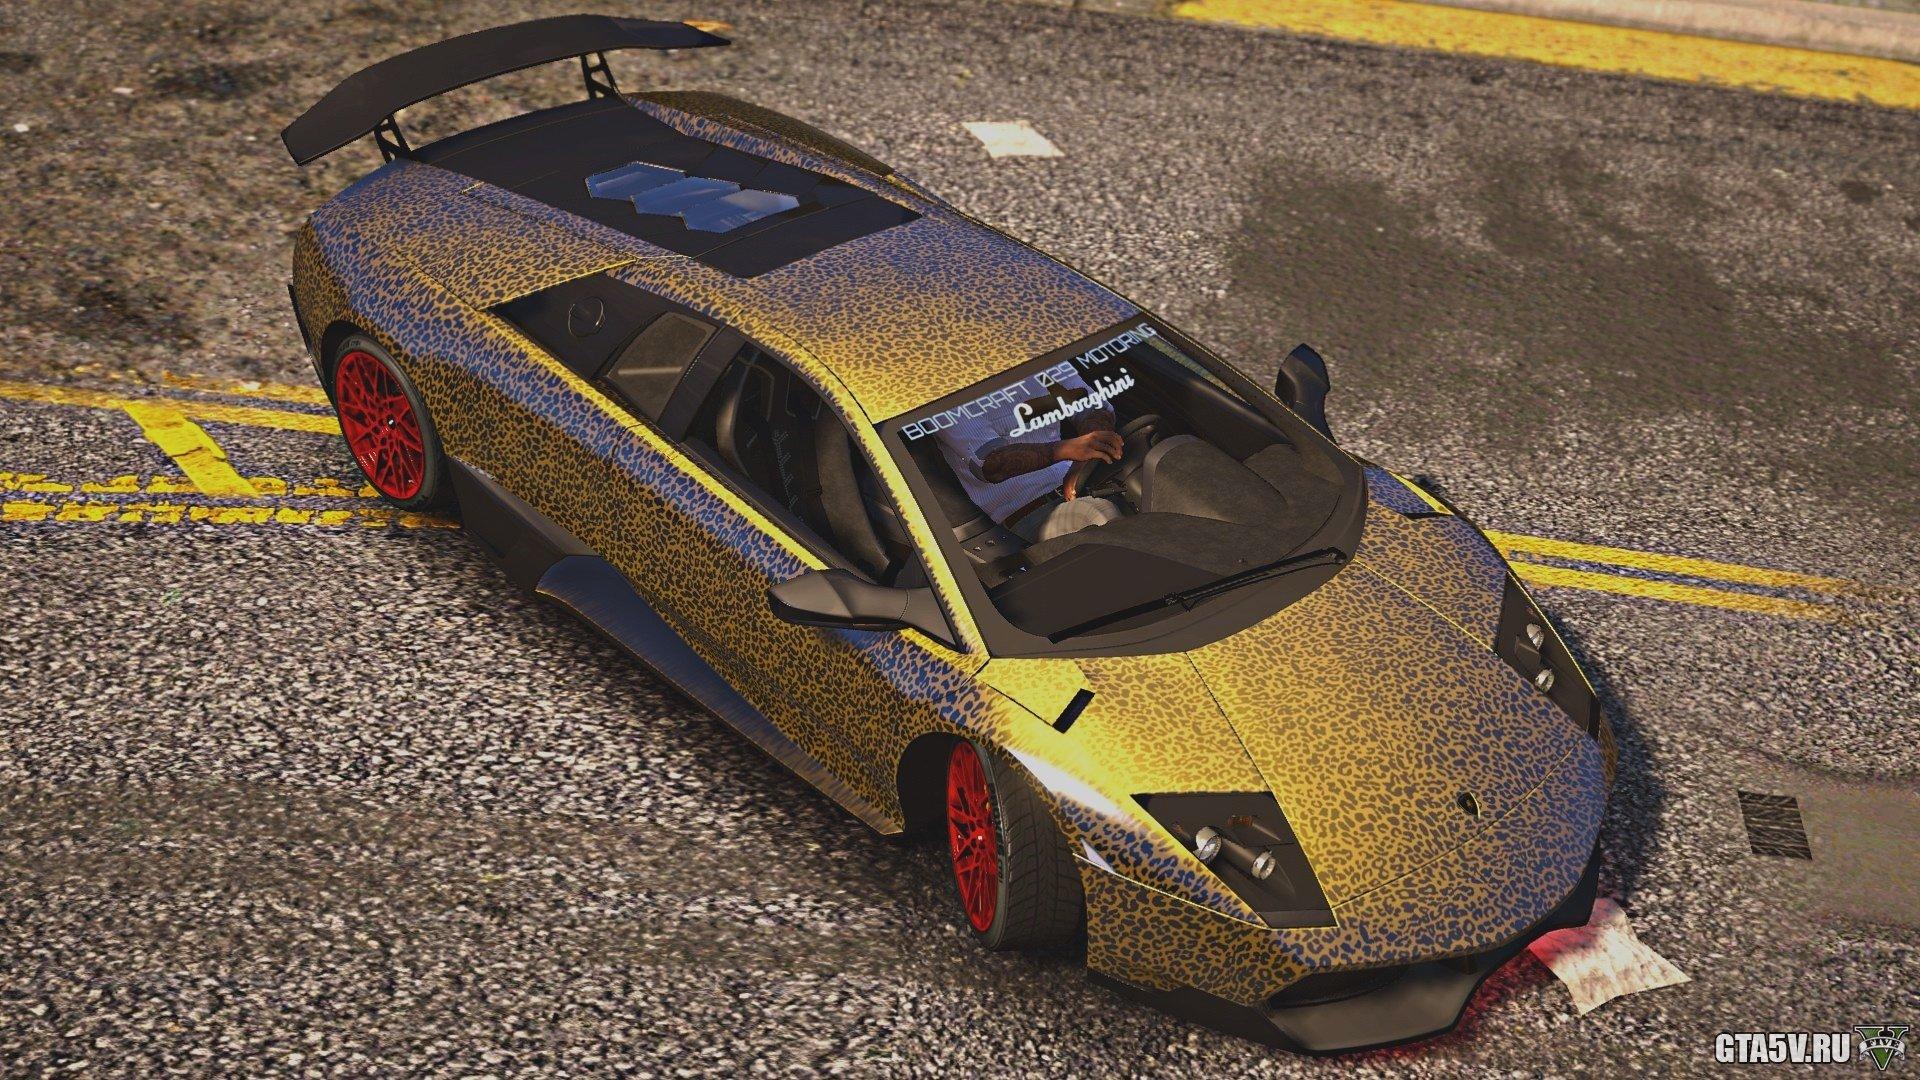 Leopard Lamborghini Murcielago